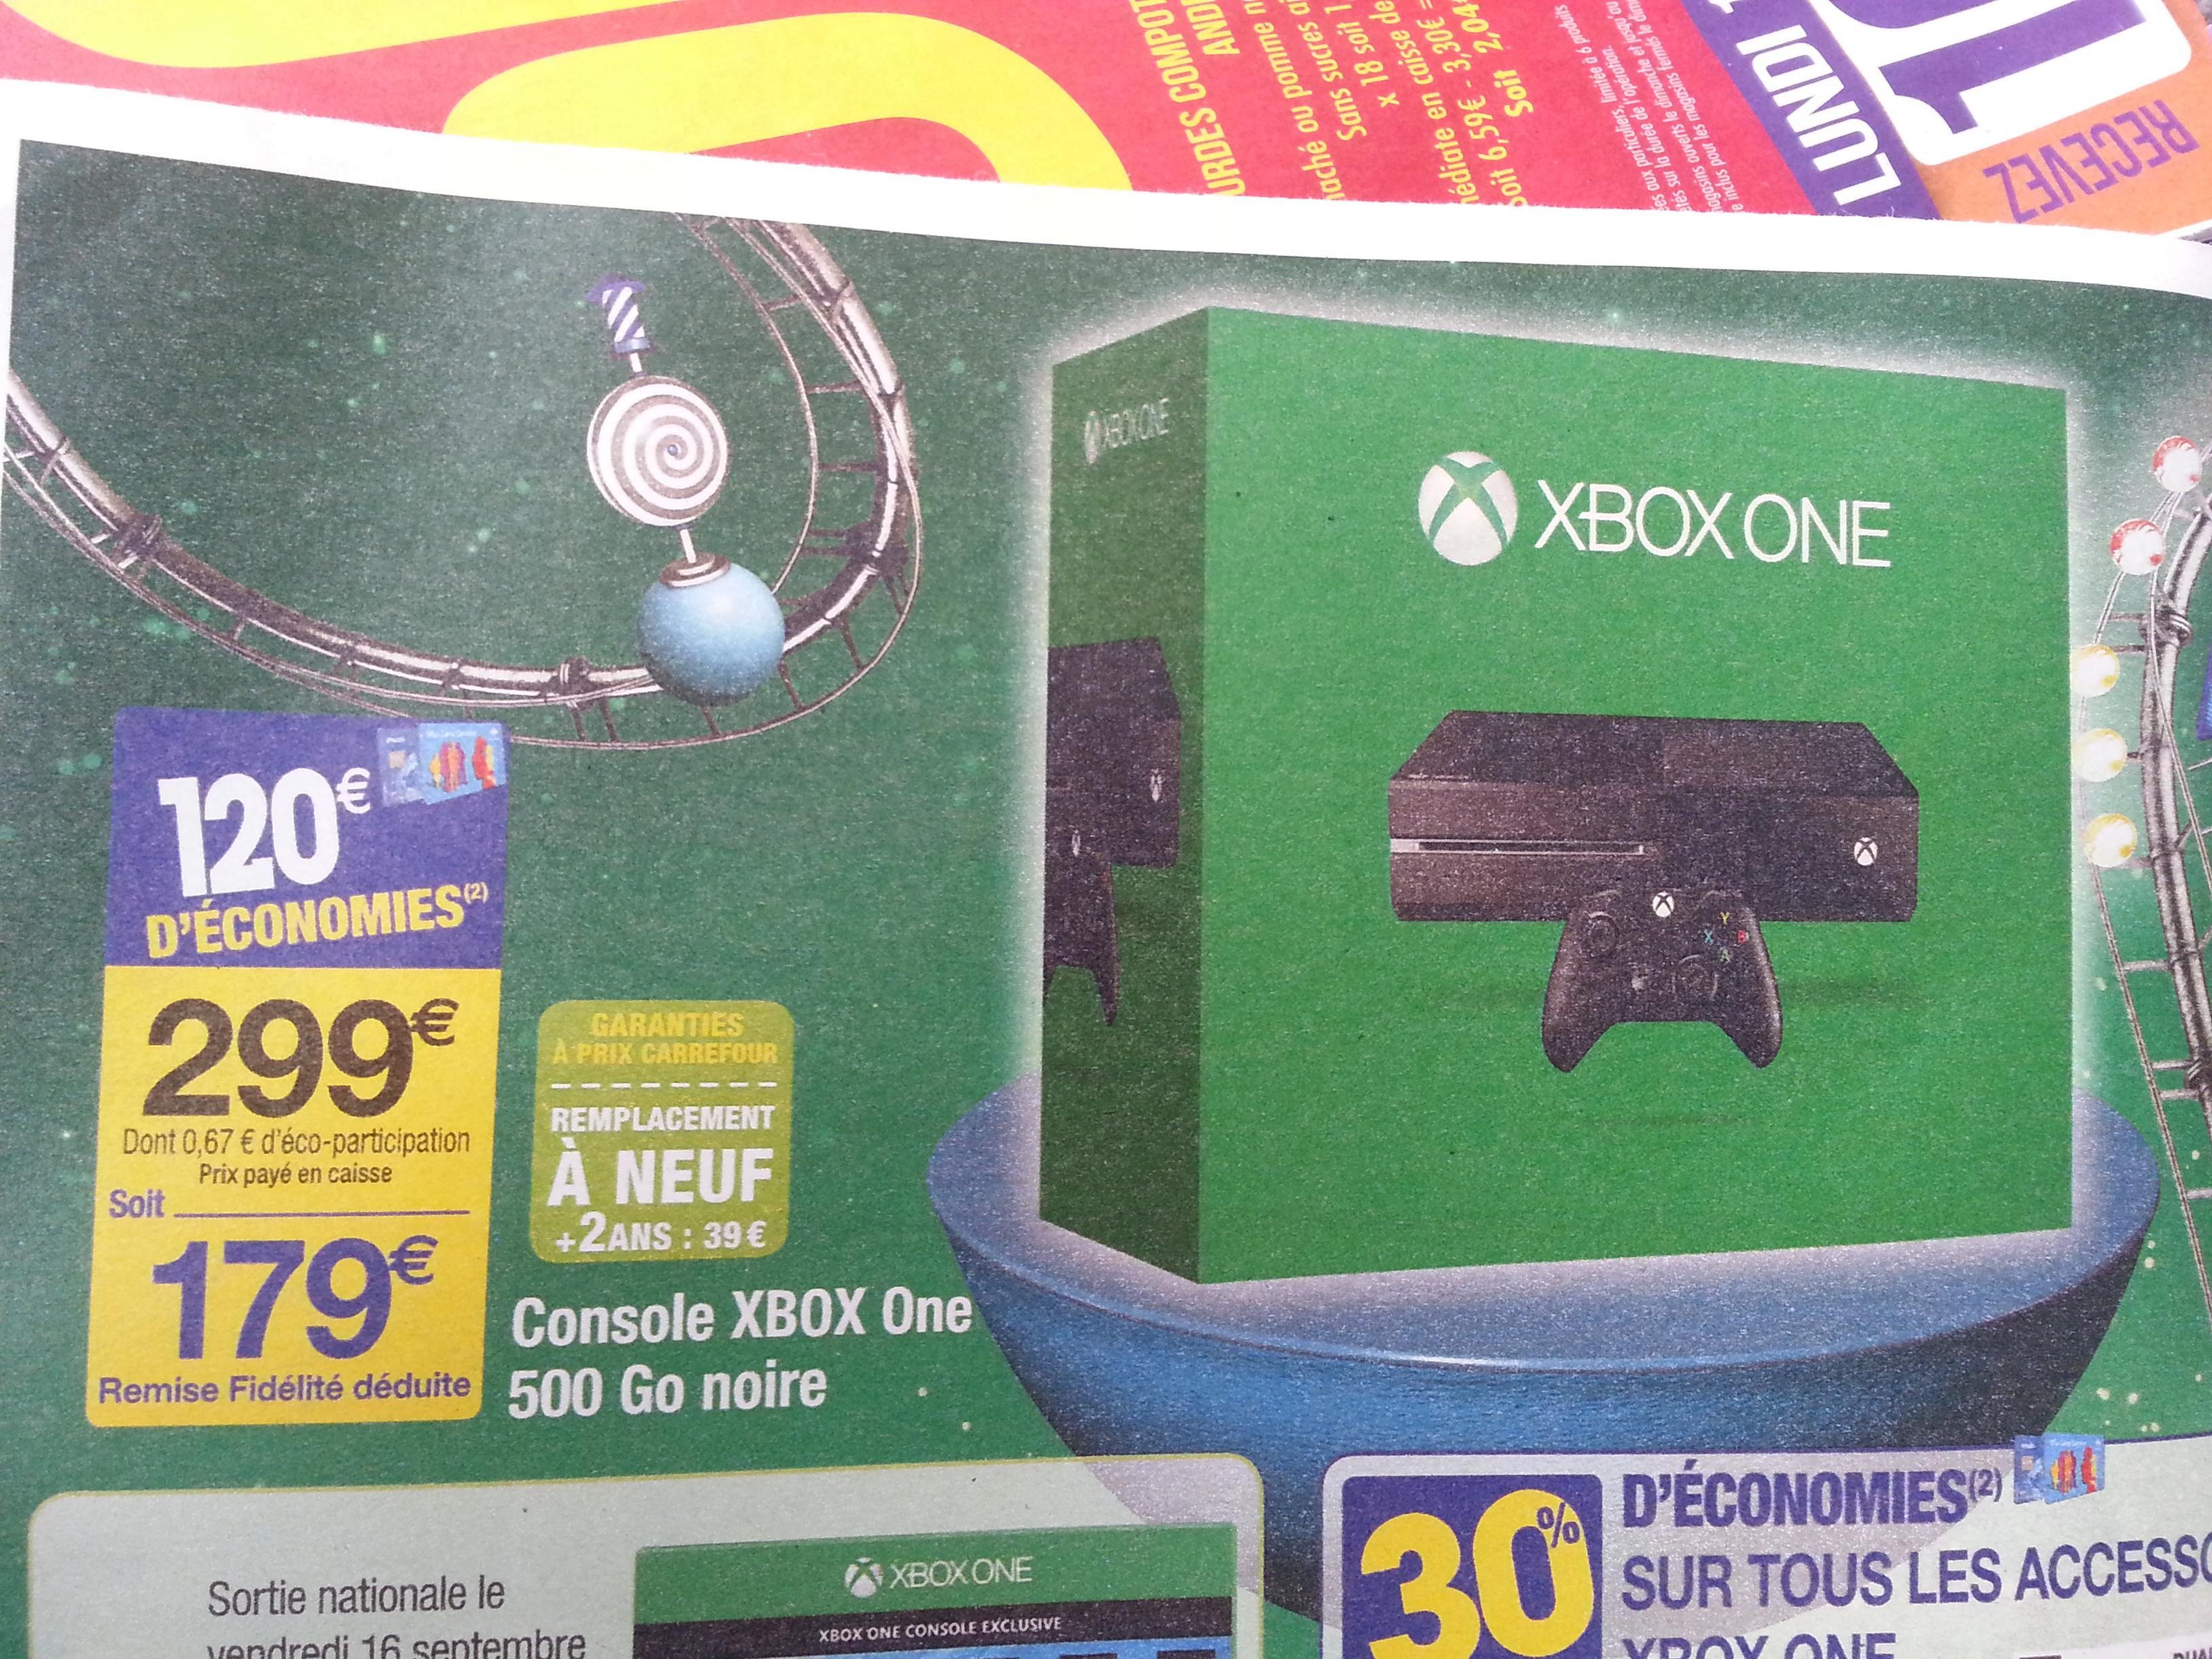 Console Microsoft  Xbox one 500 Go  (avec 120€ sur la carte)